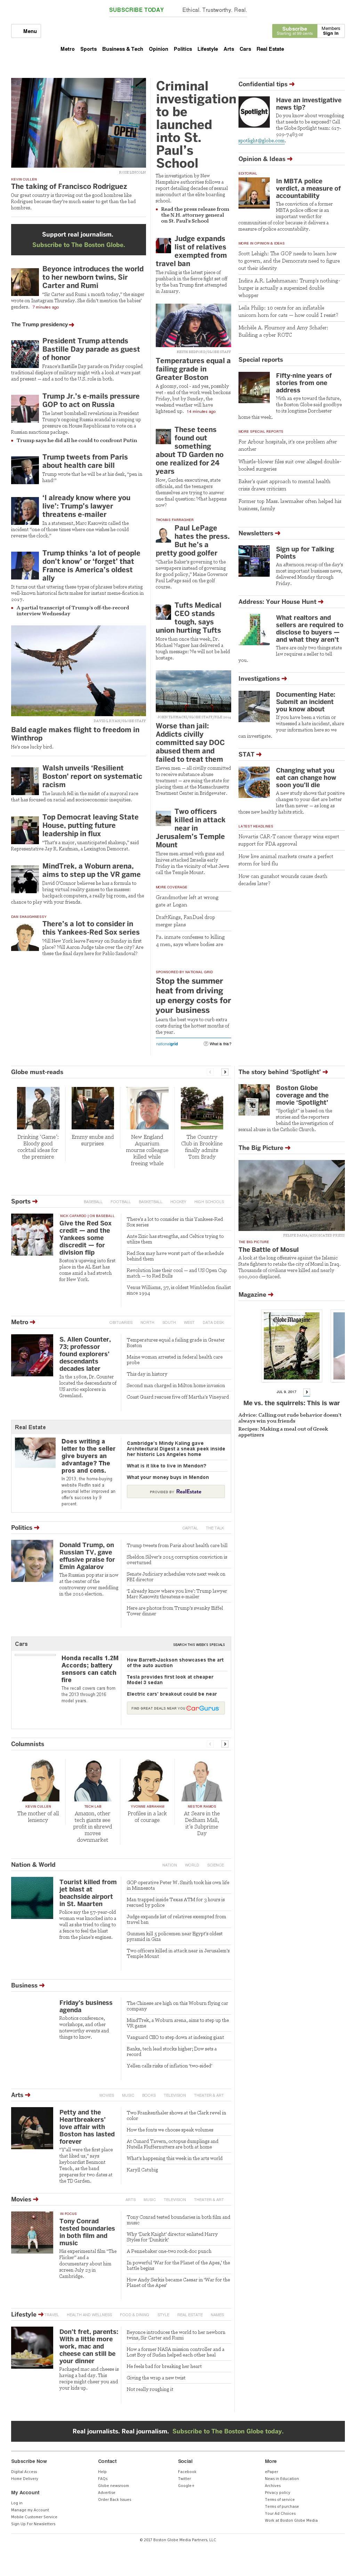 The Boston Globe at Friday July 14, 2017, 11:01 a.m. UTC